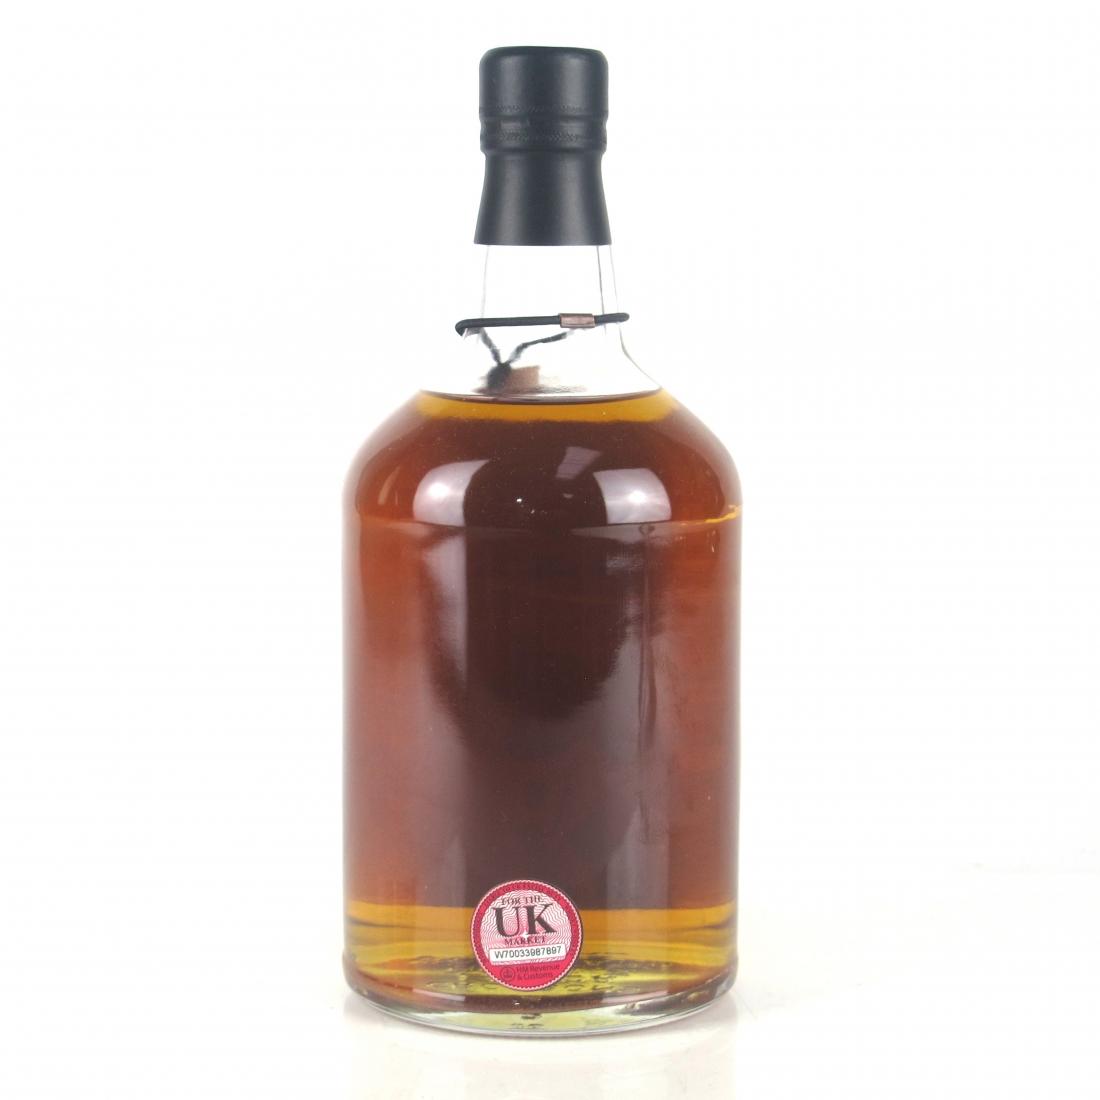 The Hielanman Spirit Drink 45 Year Old / Distilled 1971 Bottled 2017